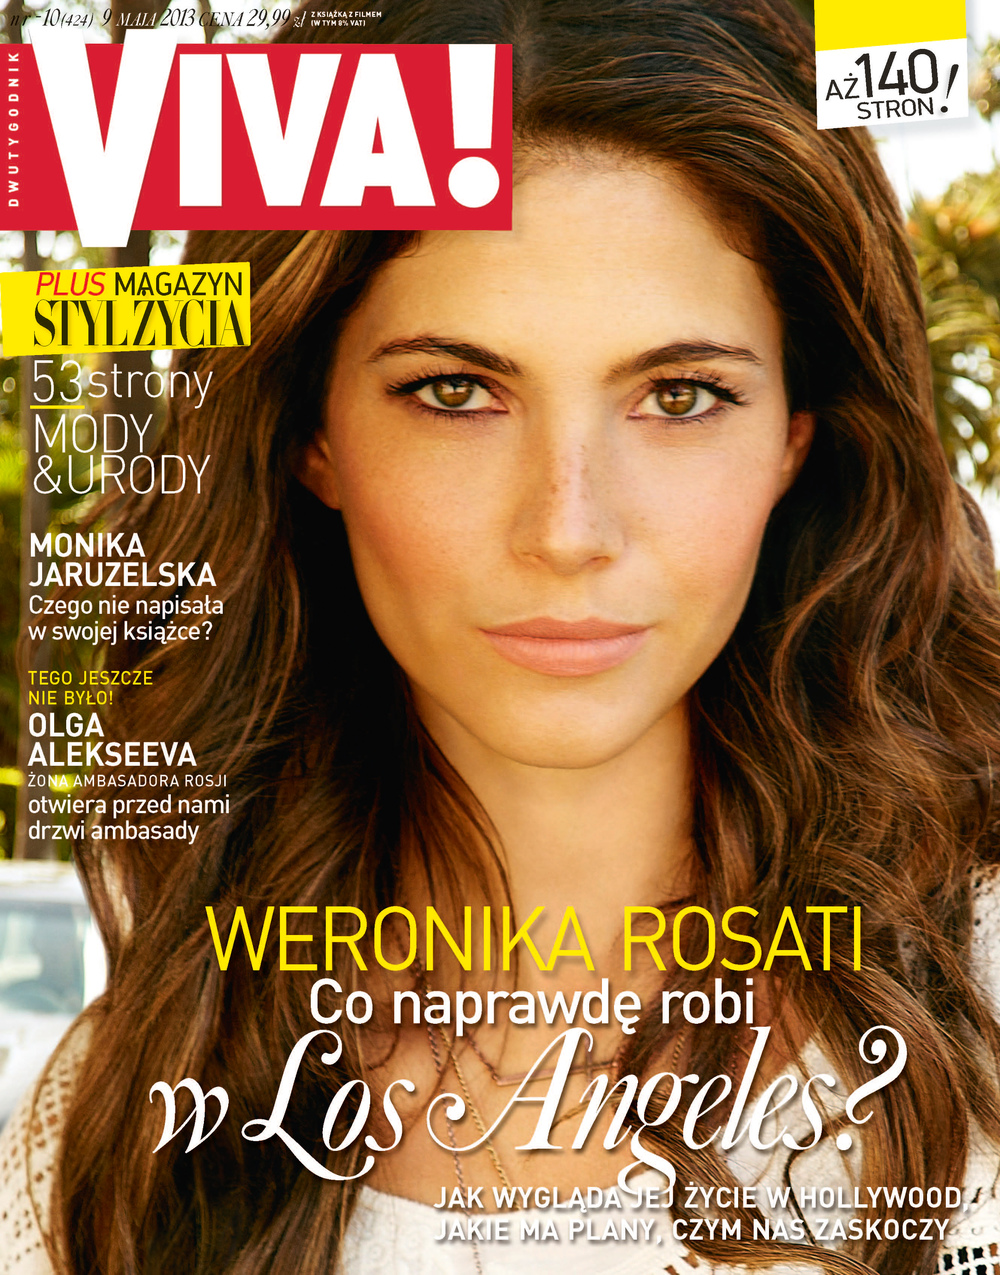 ViVA Magazine  W/Weronika Rosati